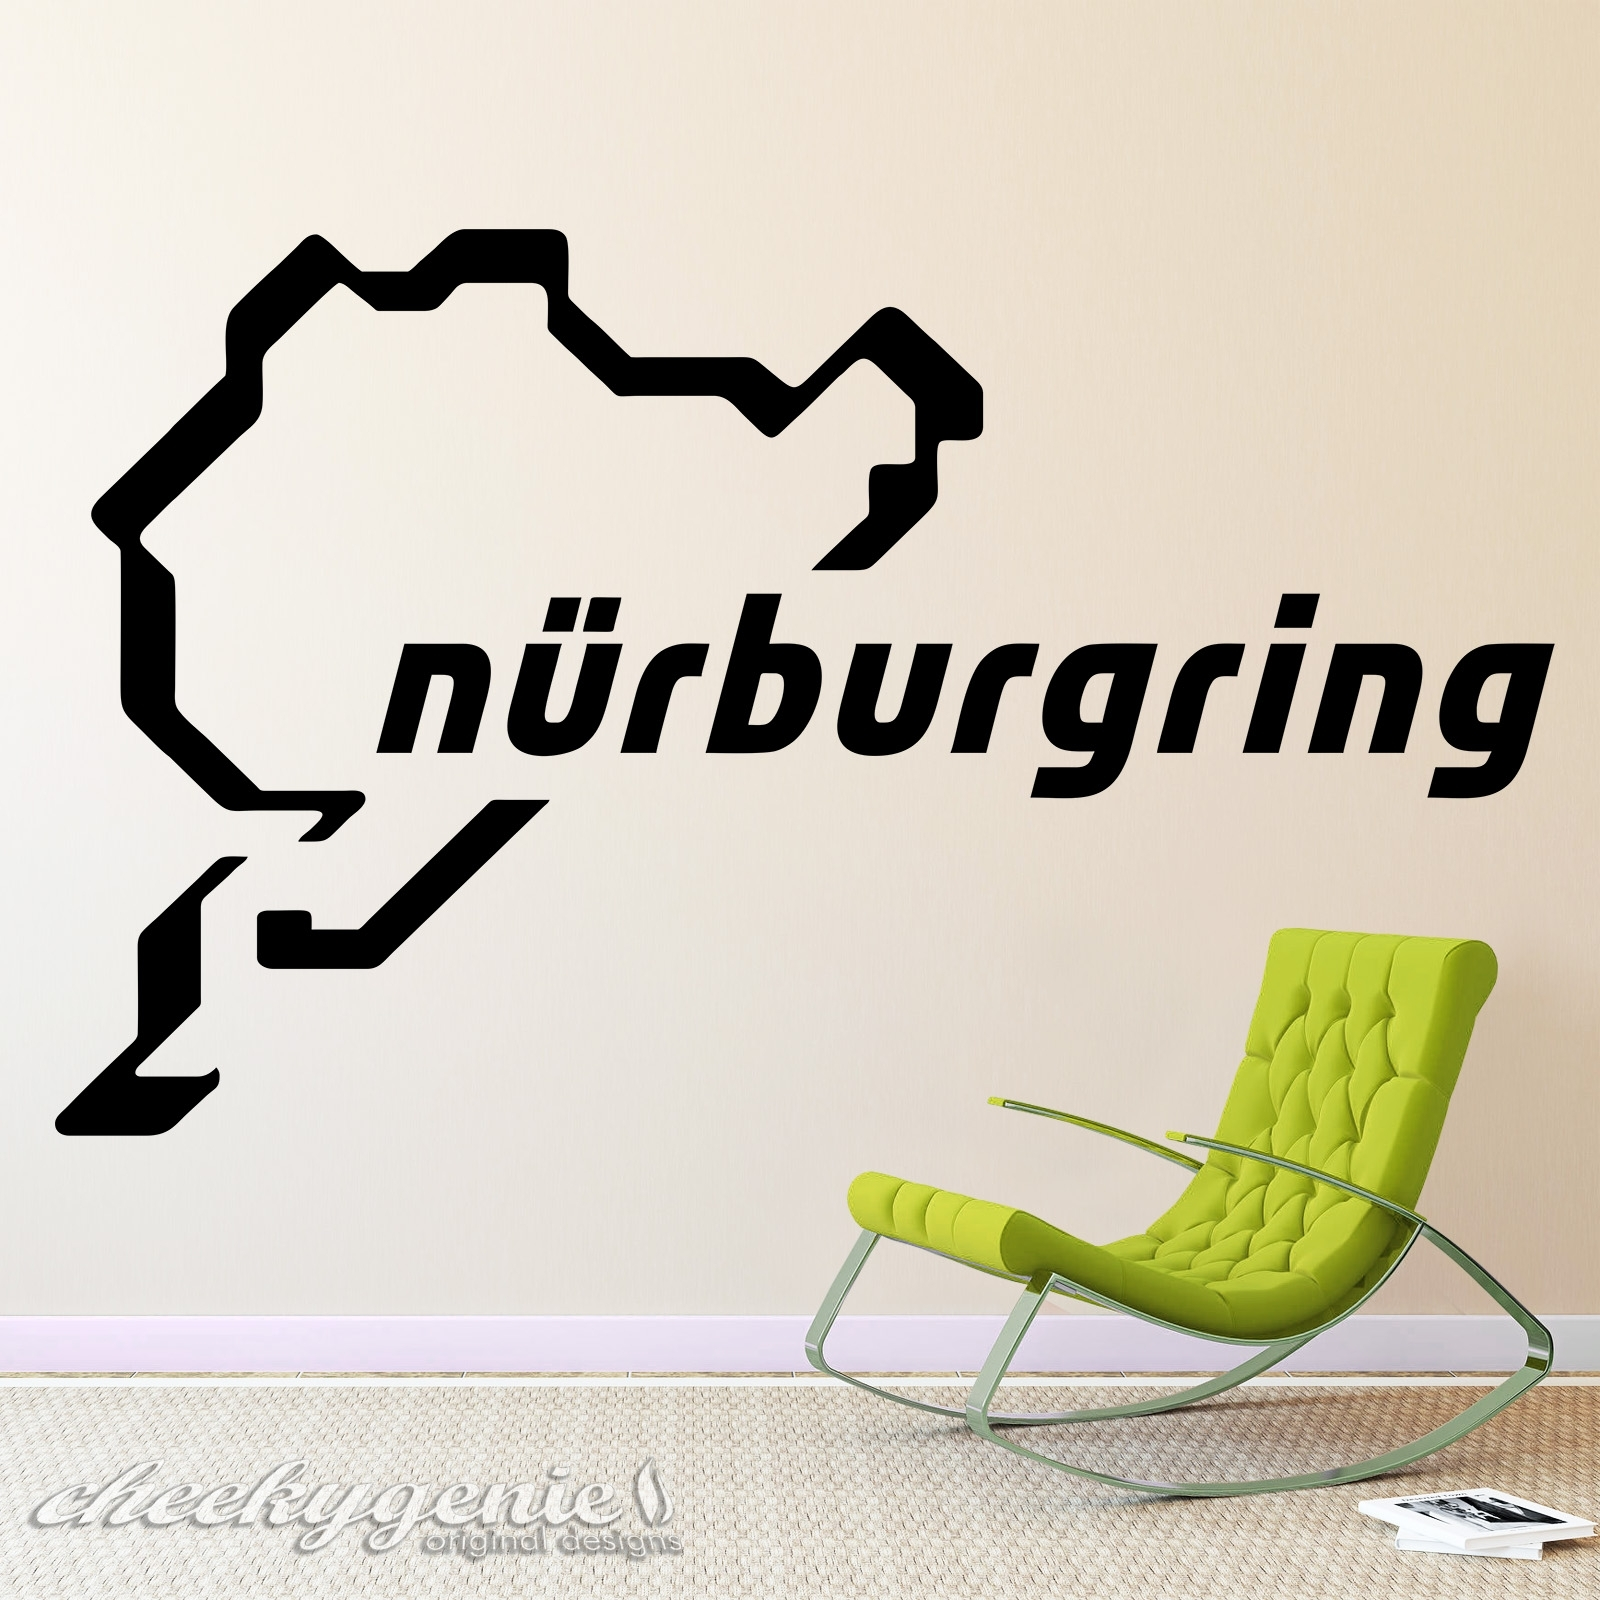 Nurburgring Racing Track Day Circuit Car Vinyl Wall Art Sticker Regarding 2018 Race Track Wall Art (View 10 of 20)